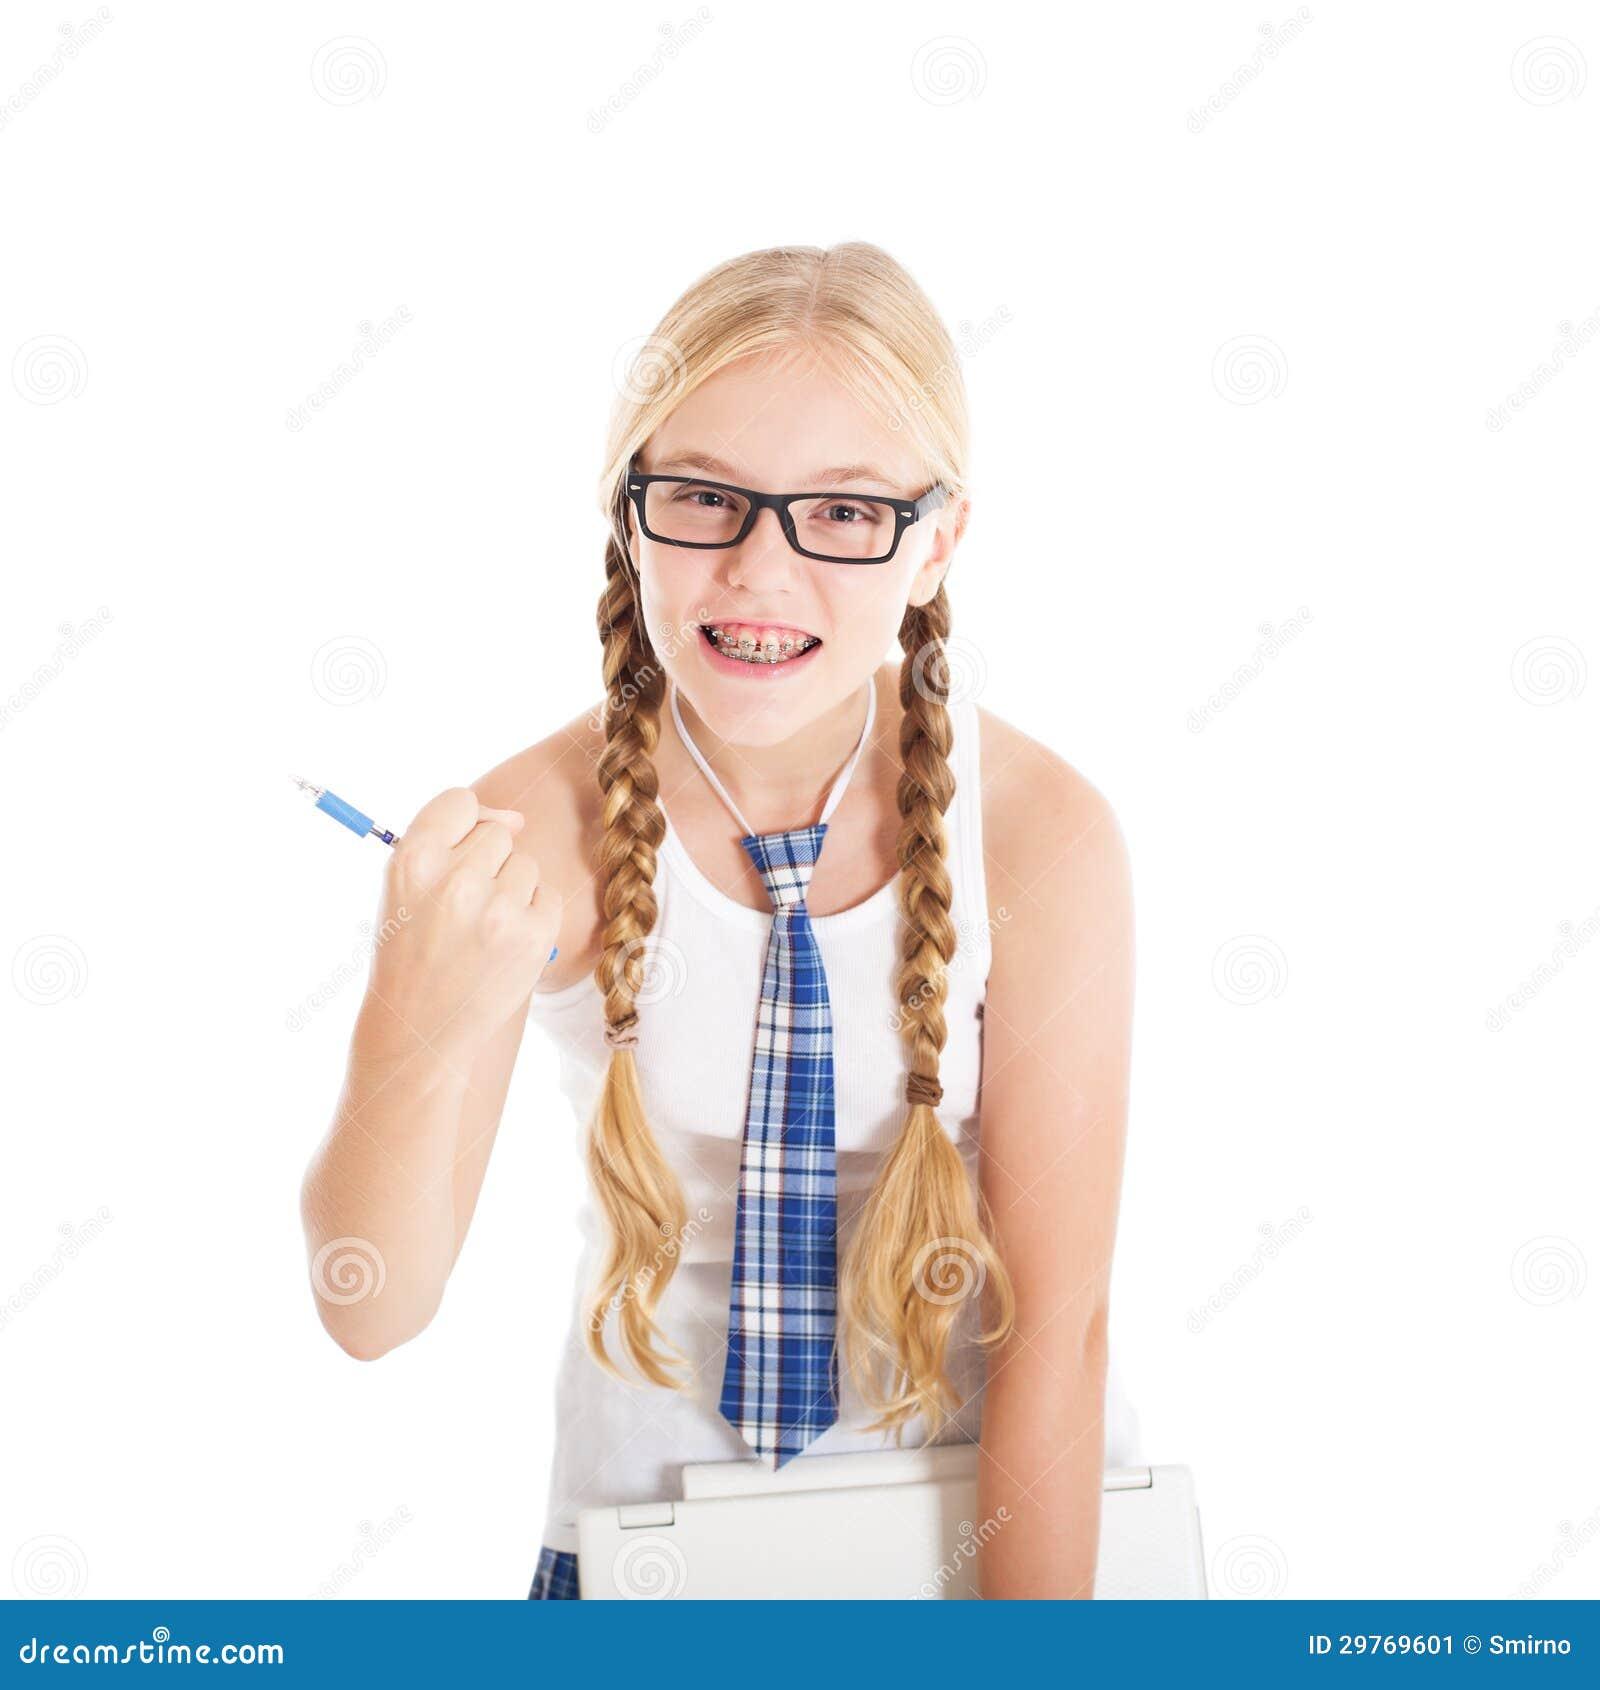 Девочка с кулочком фото фото 254-334